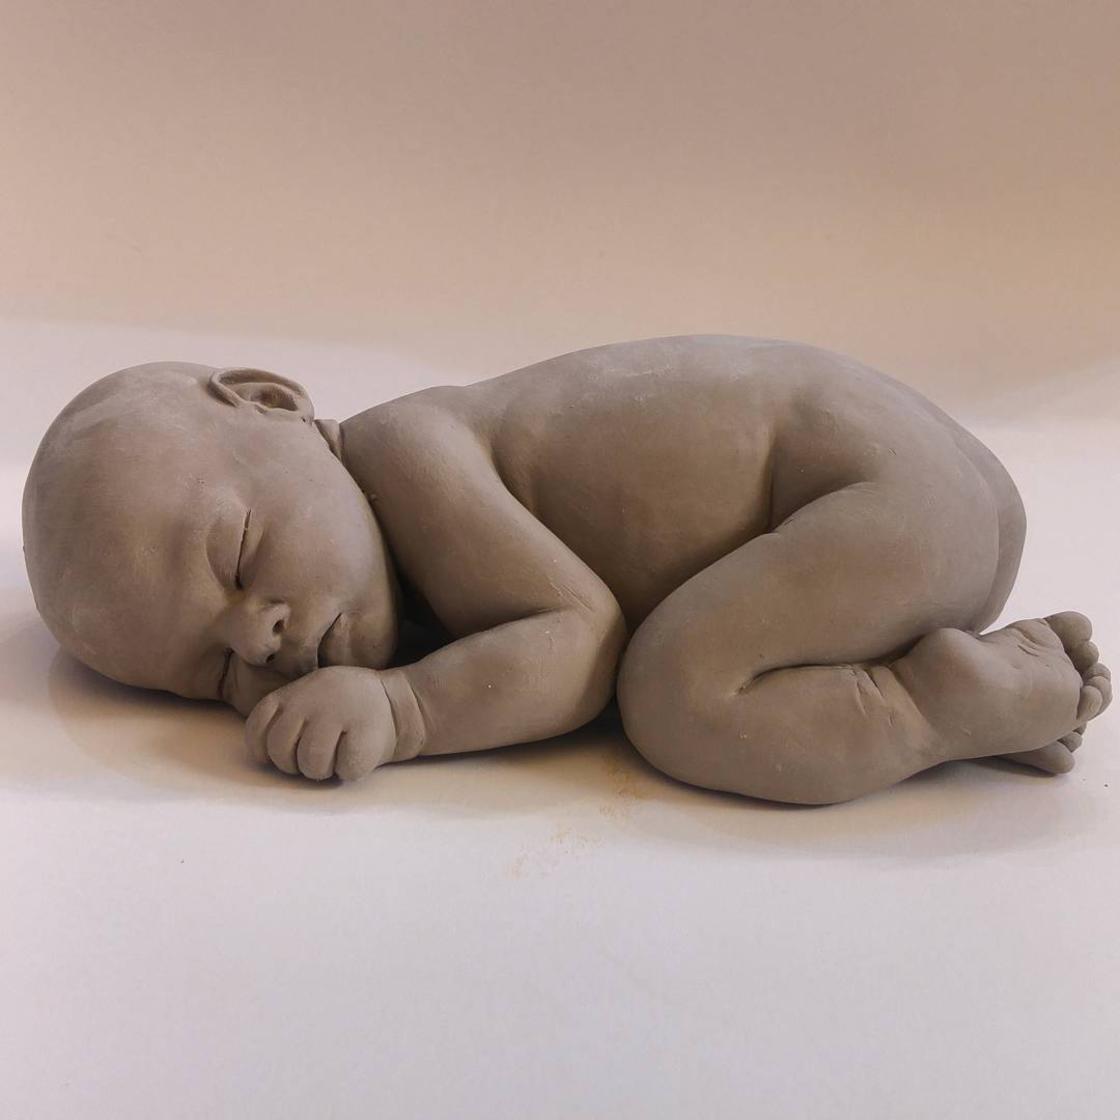 Tattooed Babies – The sculptures of Ronit Baranga